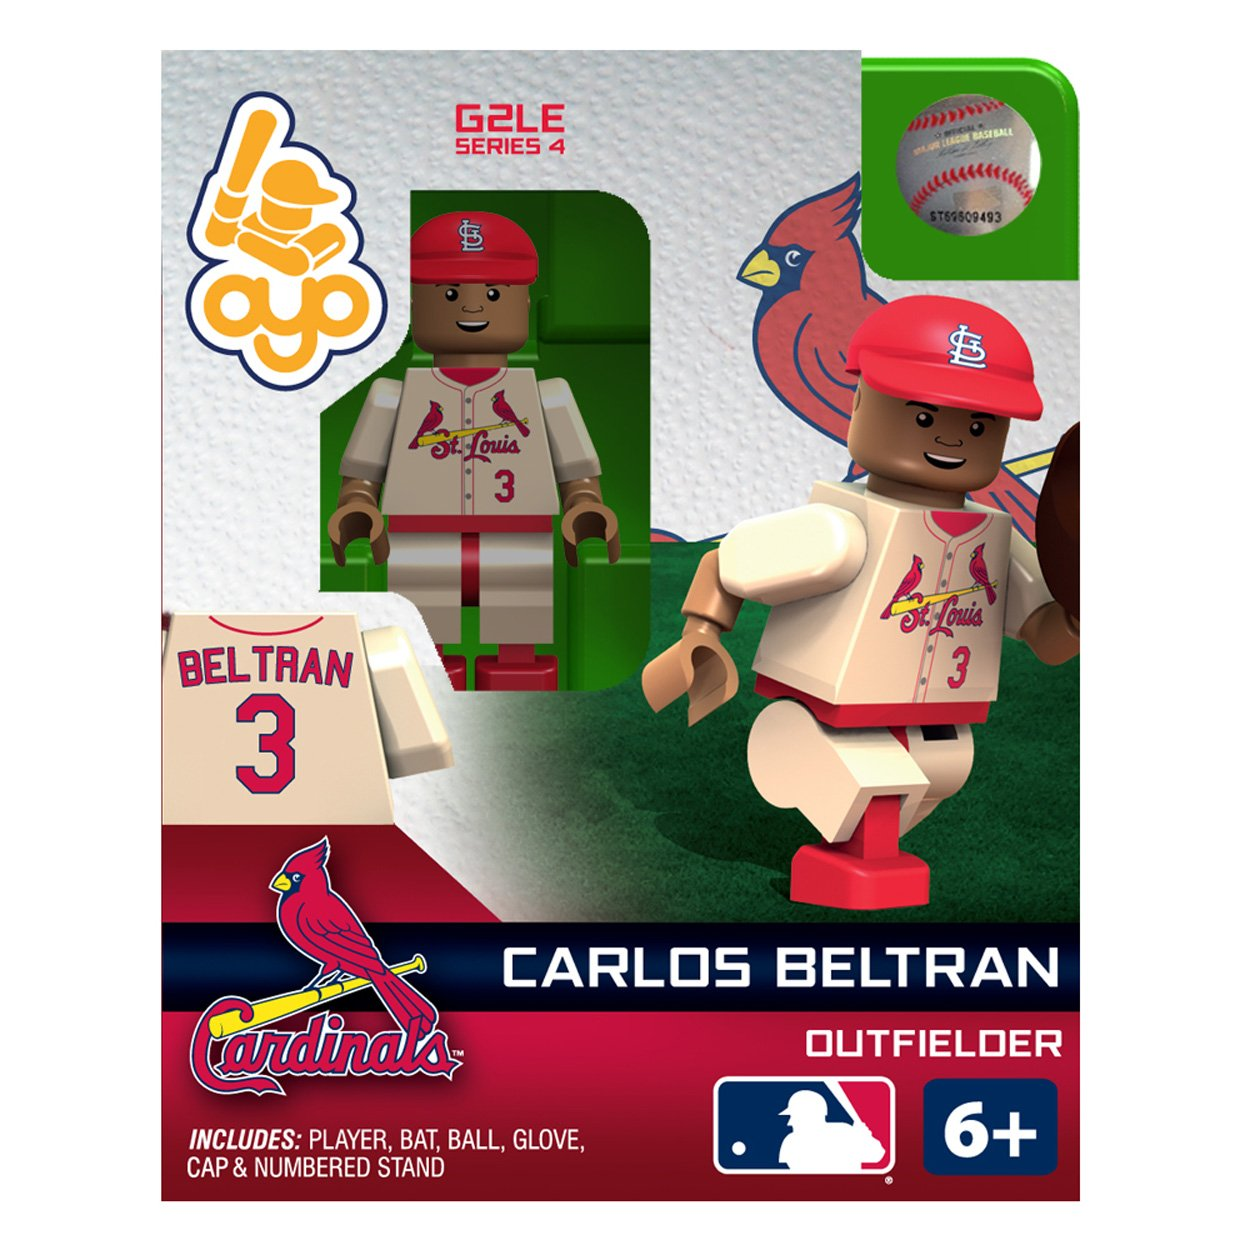 Mlb Saint Louis Cardinals Carlos Beltran Oyo Figure